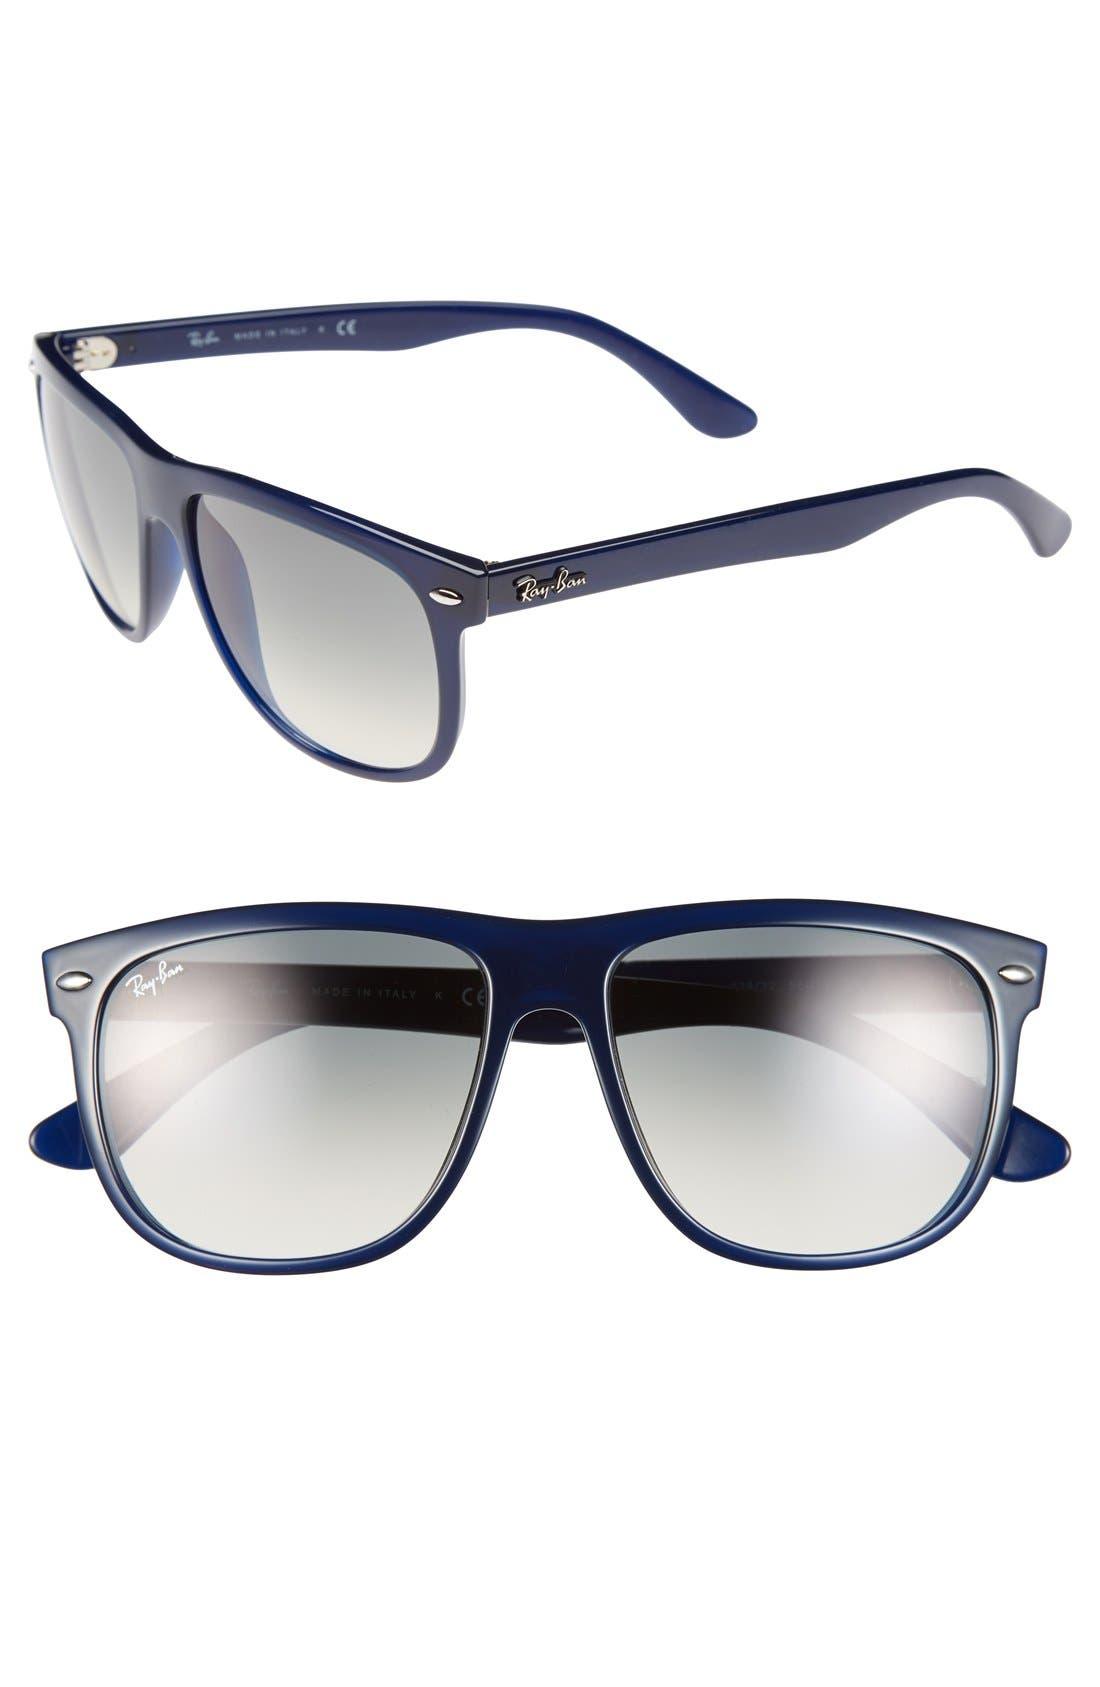 Alternate Image 1 Selected - Ray-Ban 'Boyfriend Flat Top Frame' 56mm Sunglasses